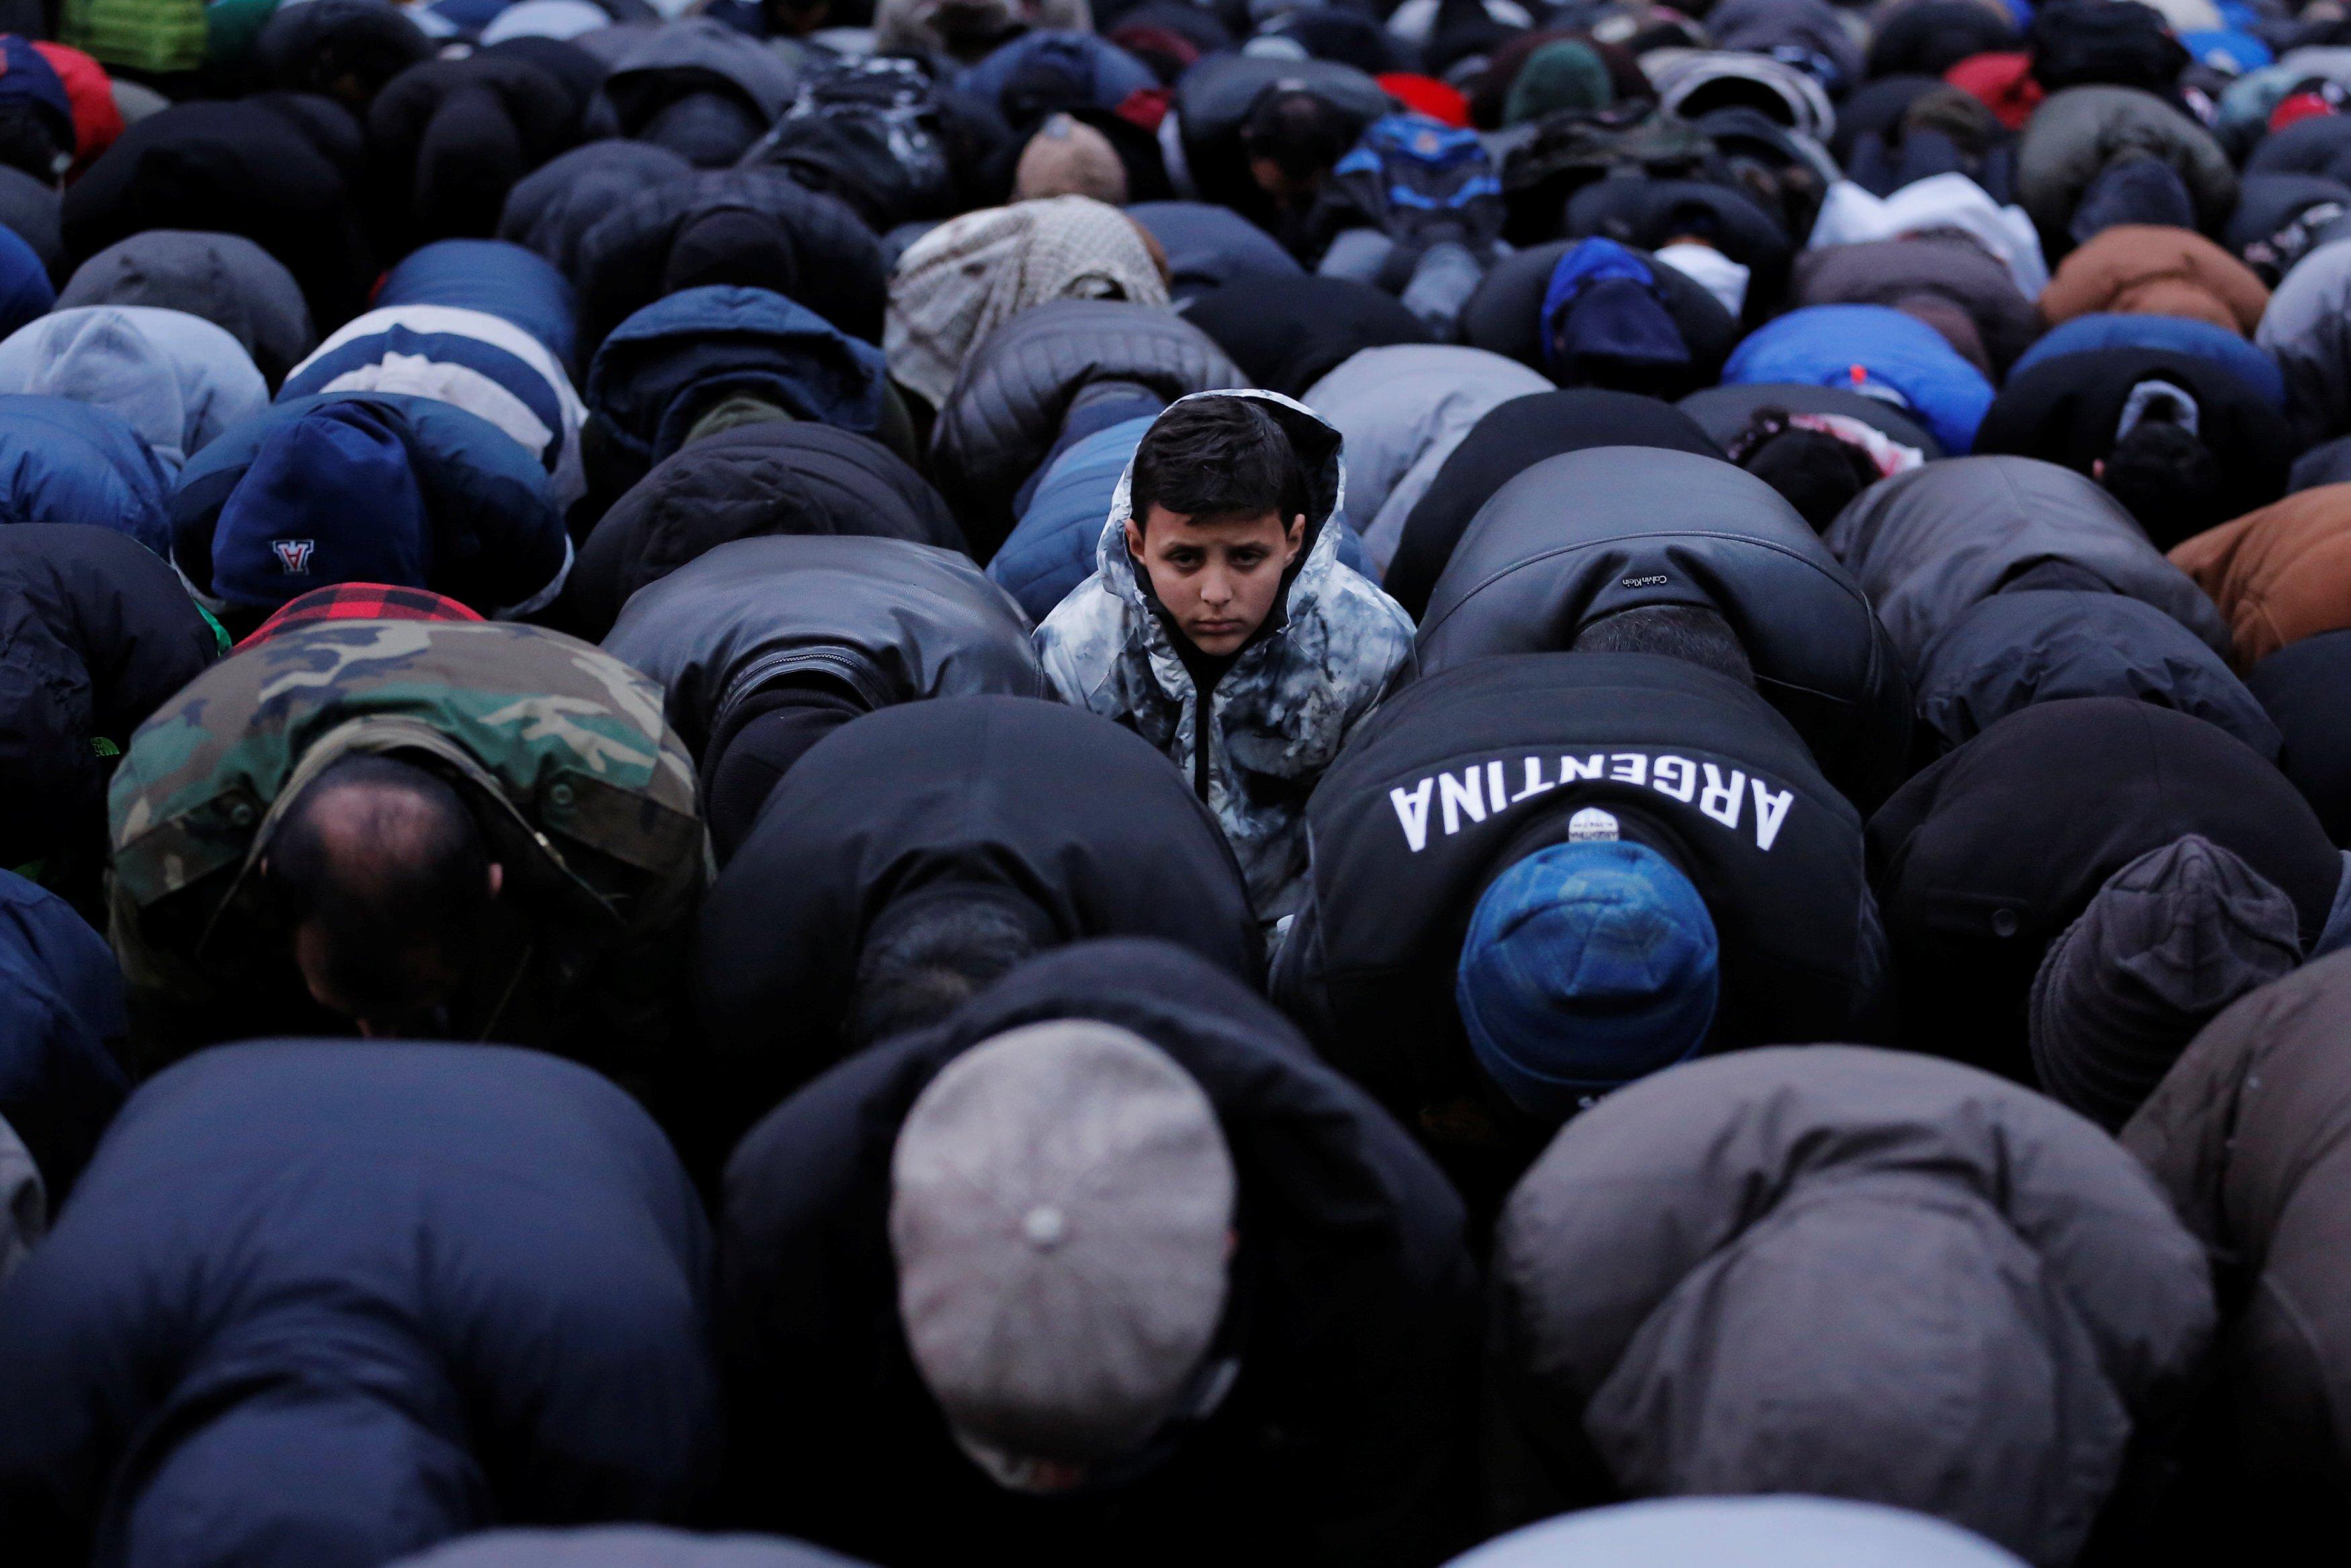 Seorang anak lelaki melihat saat para pendemo beribadah ketika berpartisipasi dalam sebuah protes oleh komunitas Yaman terhadap larangan perjalanan yang diberlakukan oleh Presiden Amerika Serikat Donald Trump di Brooklyn, New York, Amerika Serikat, Kamis (2/2).